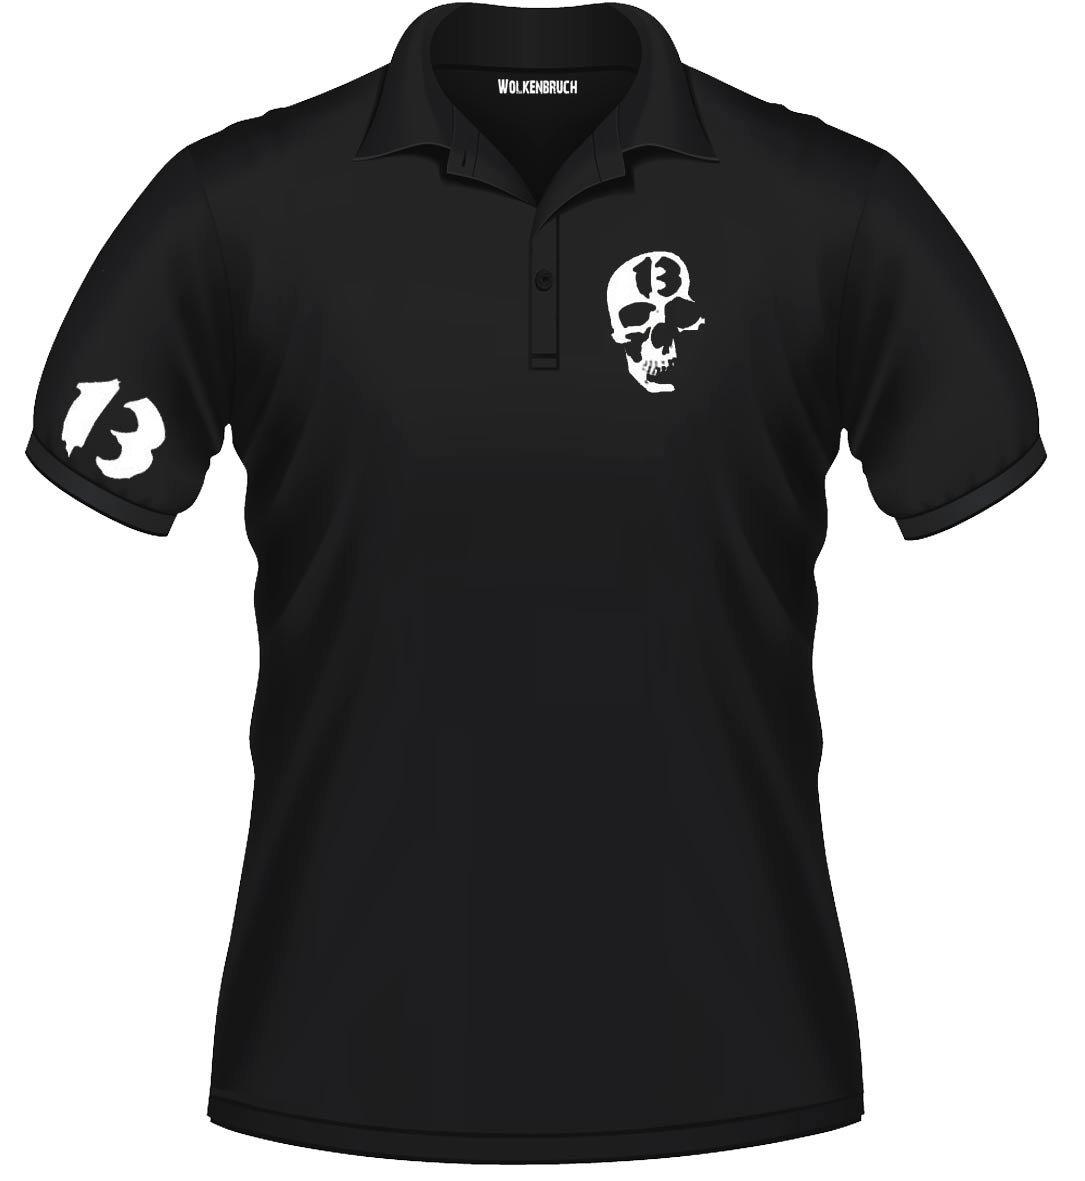 Sputnik Shirts - Polo Skull 13 con teschio, taglie da S a 5XL